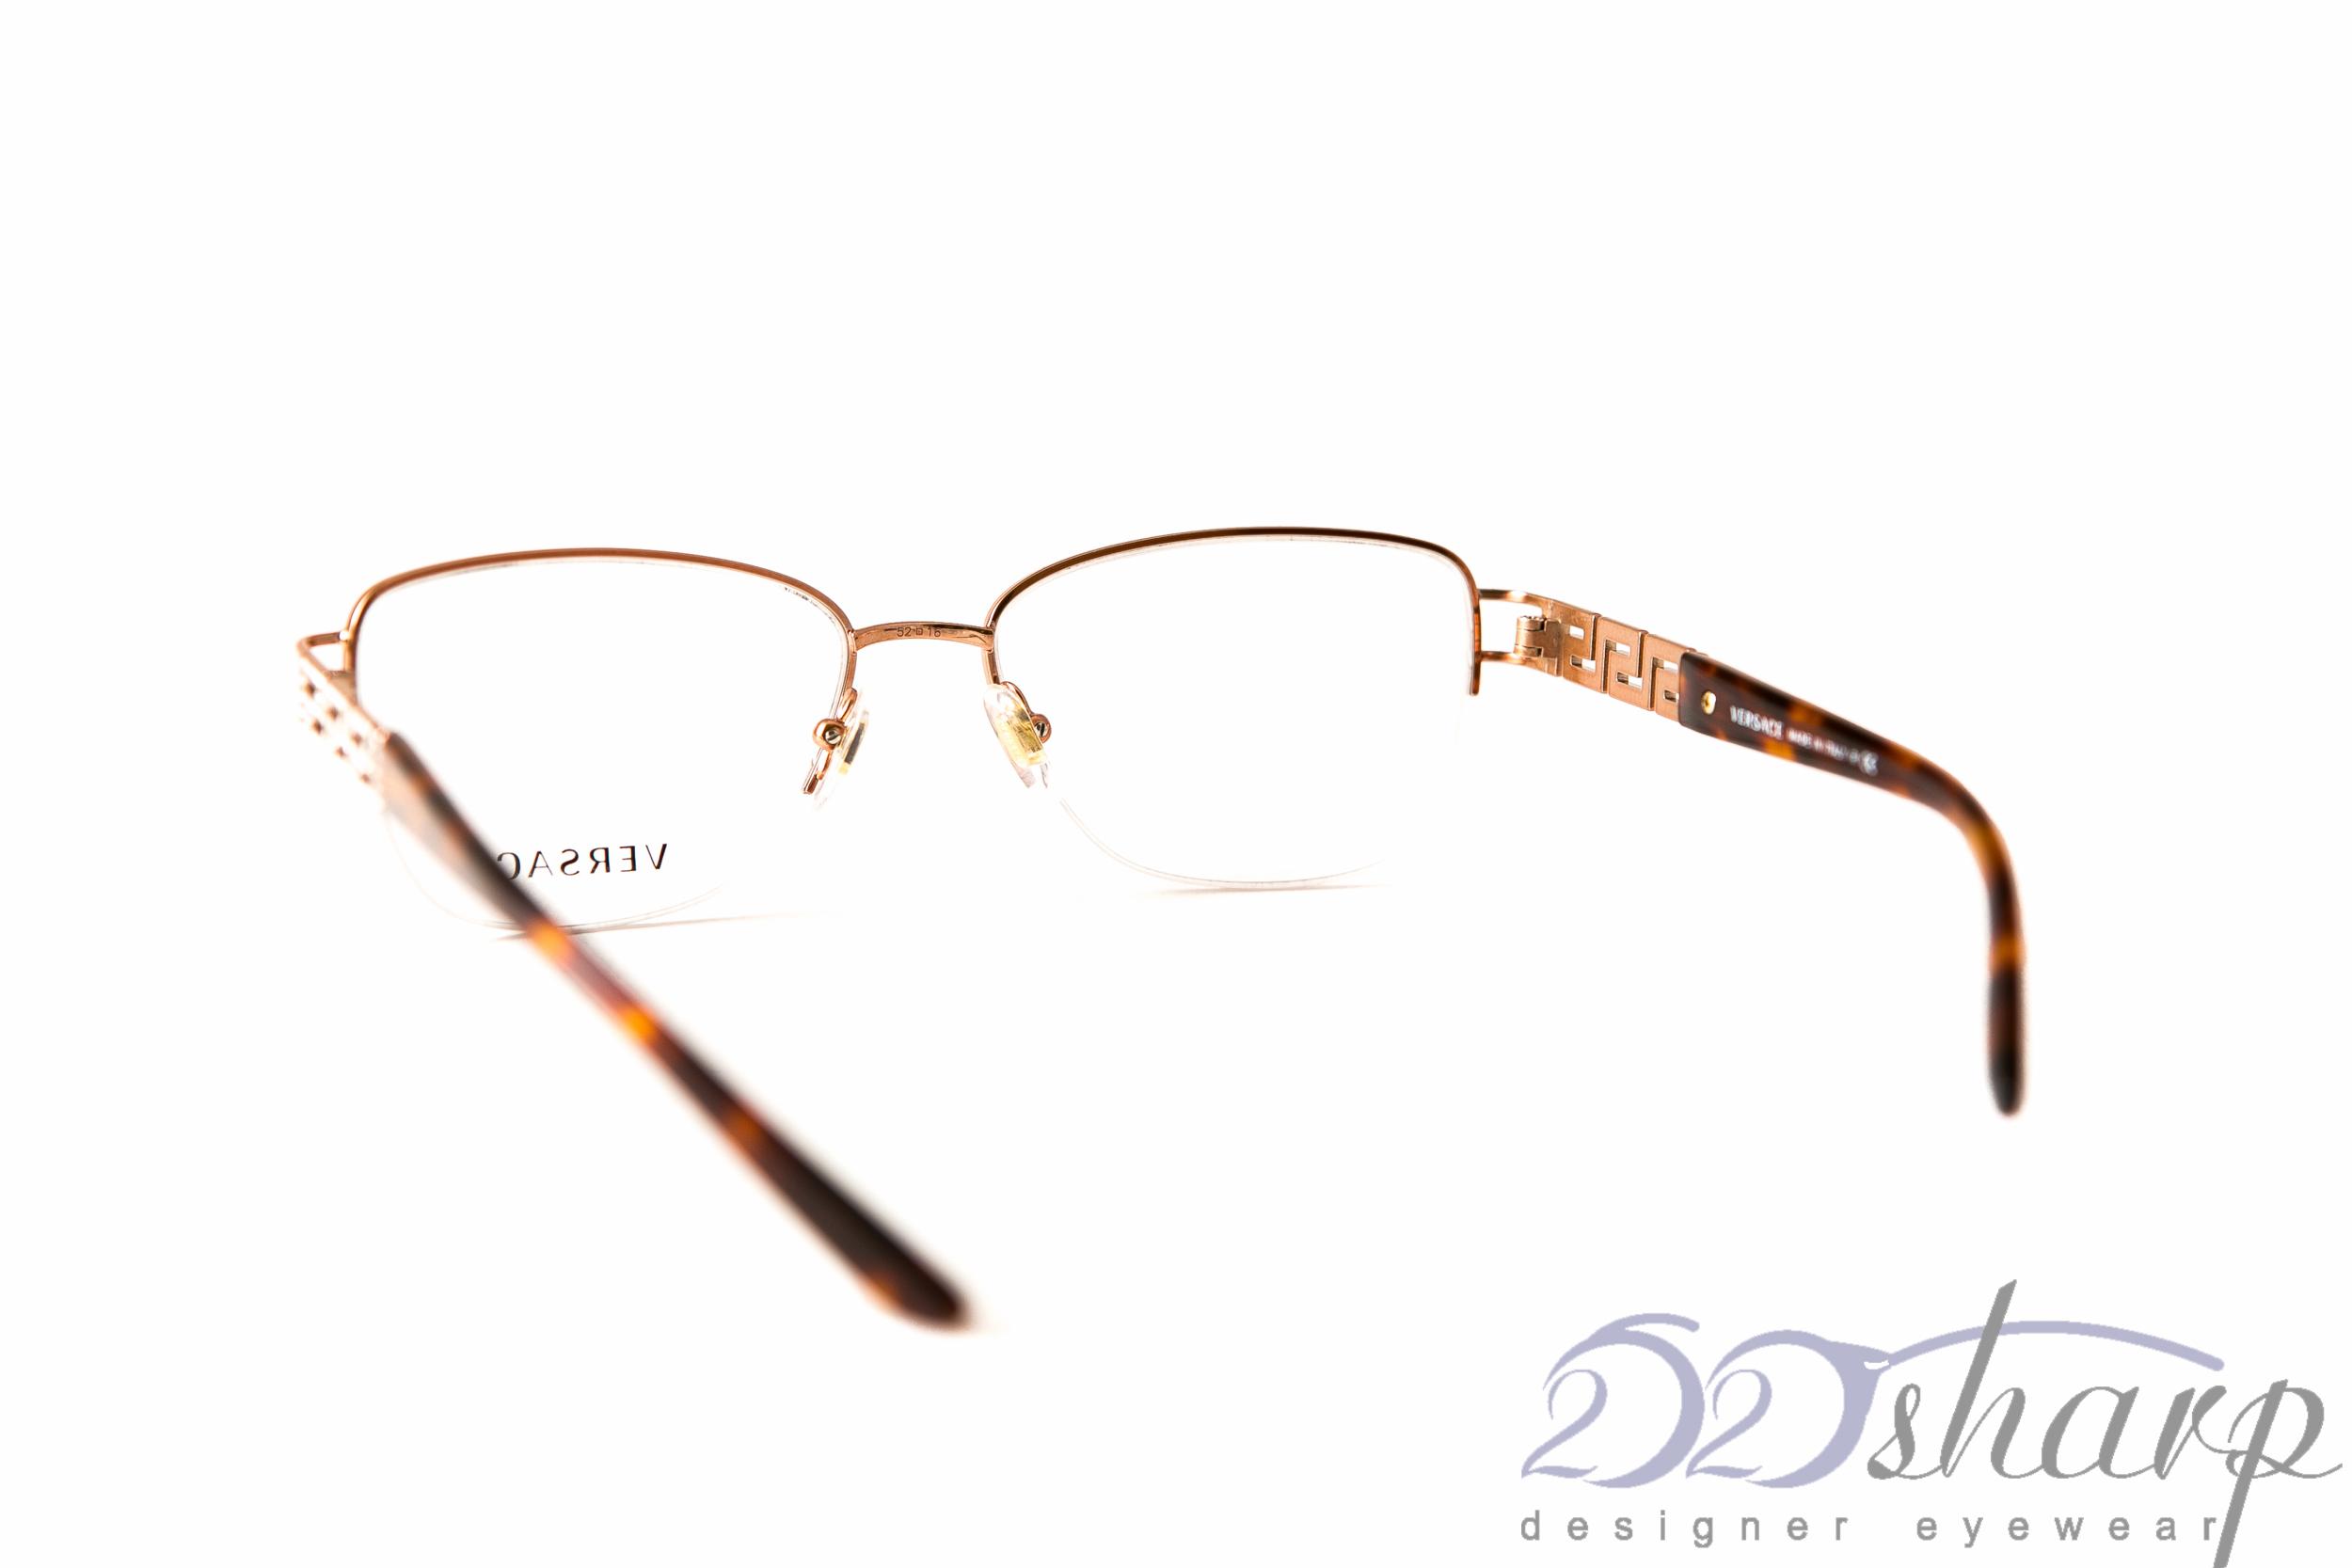 c306795a561 Versace Eyeglasses-Versace 1220B 1052 52-16 Copper